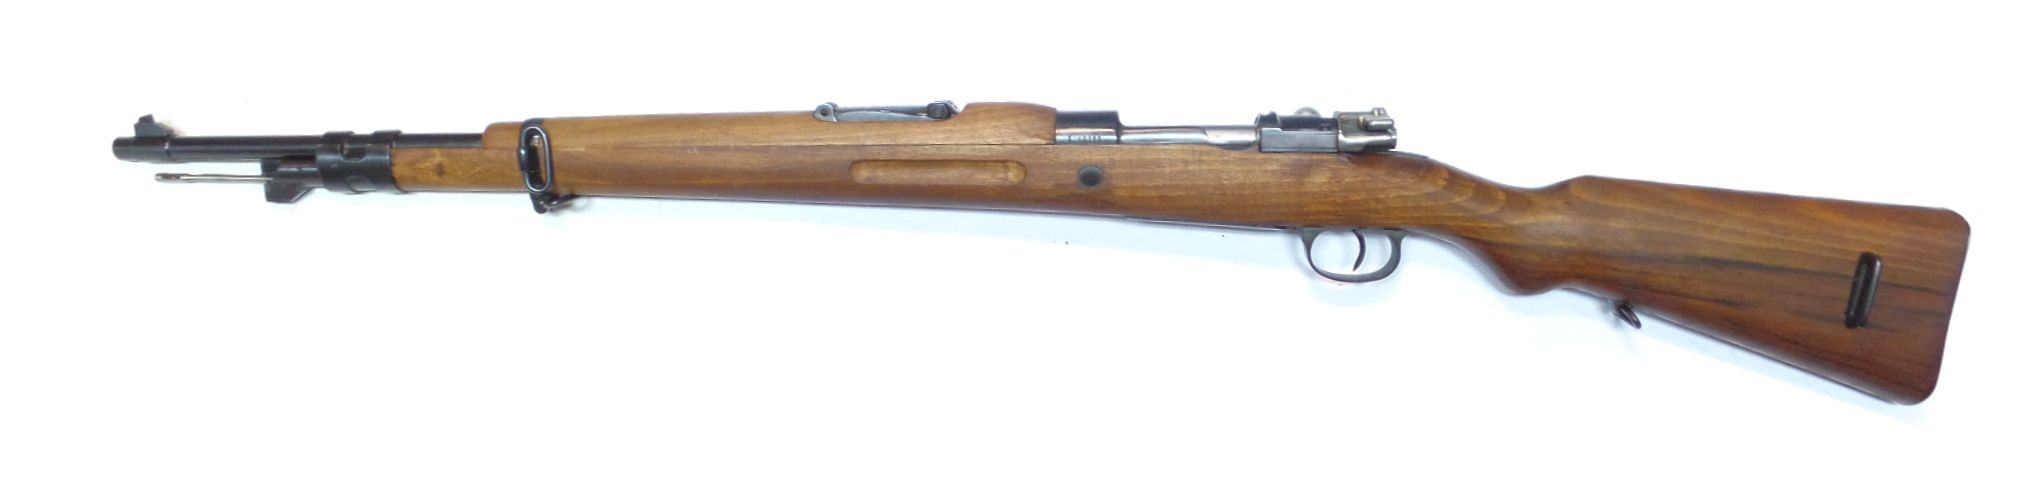 SANTA BARBARA 98K calibre 8x57IS